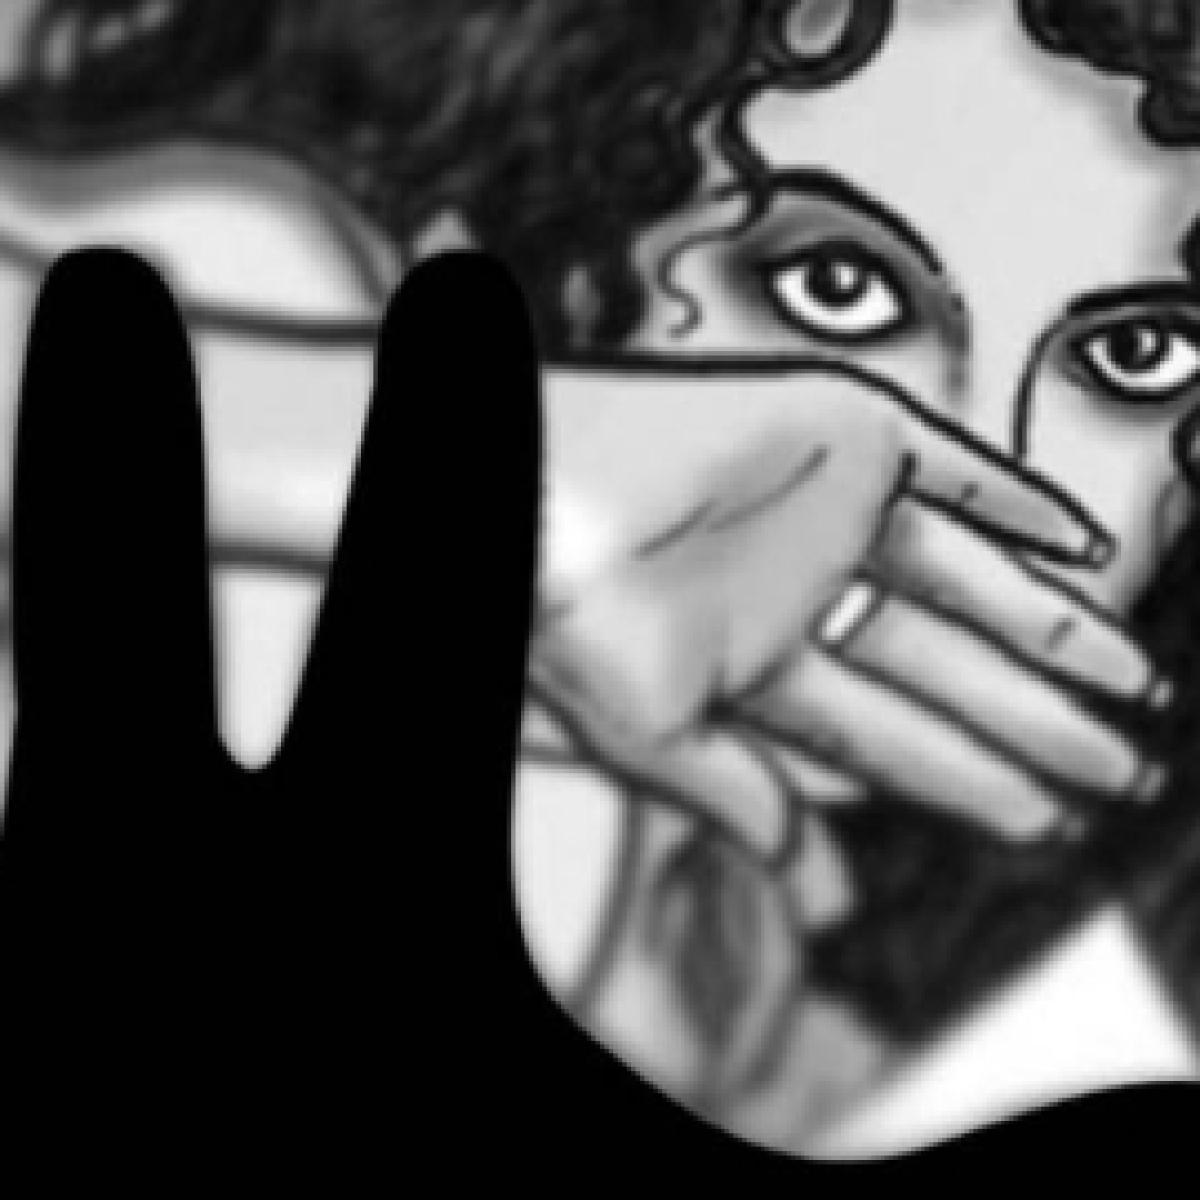 Mumbai Crime Watch: Vikhroli man arrested under POCSO for molesting daughter